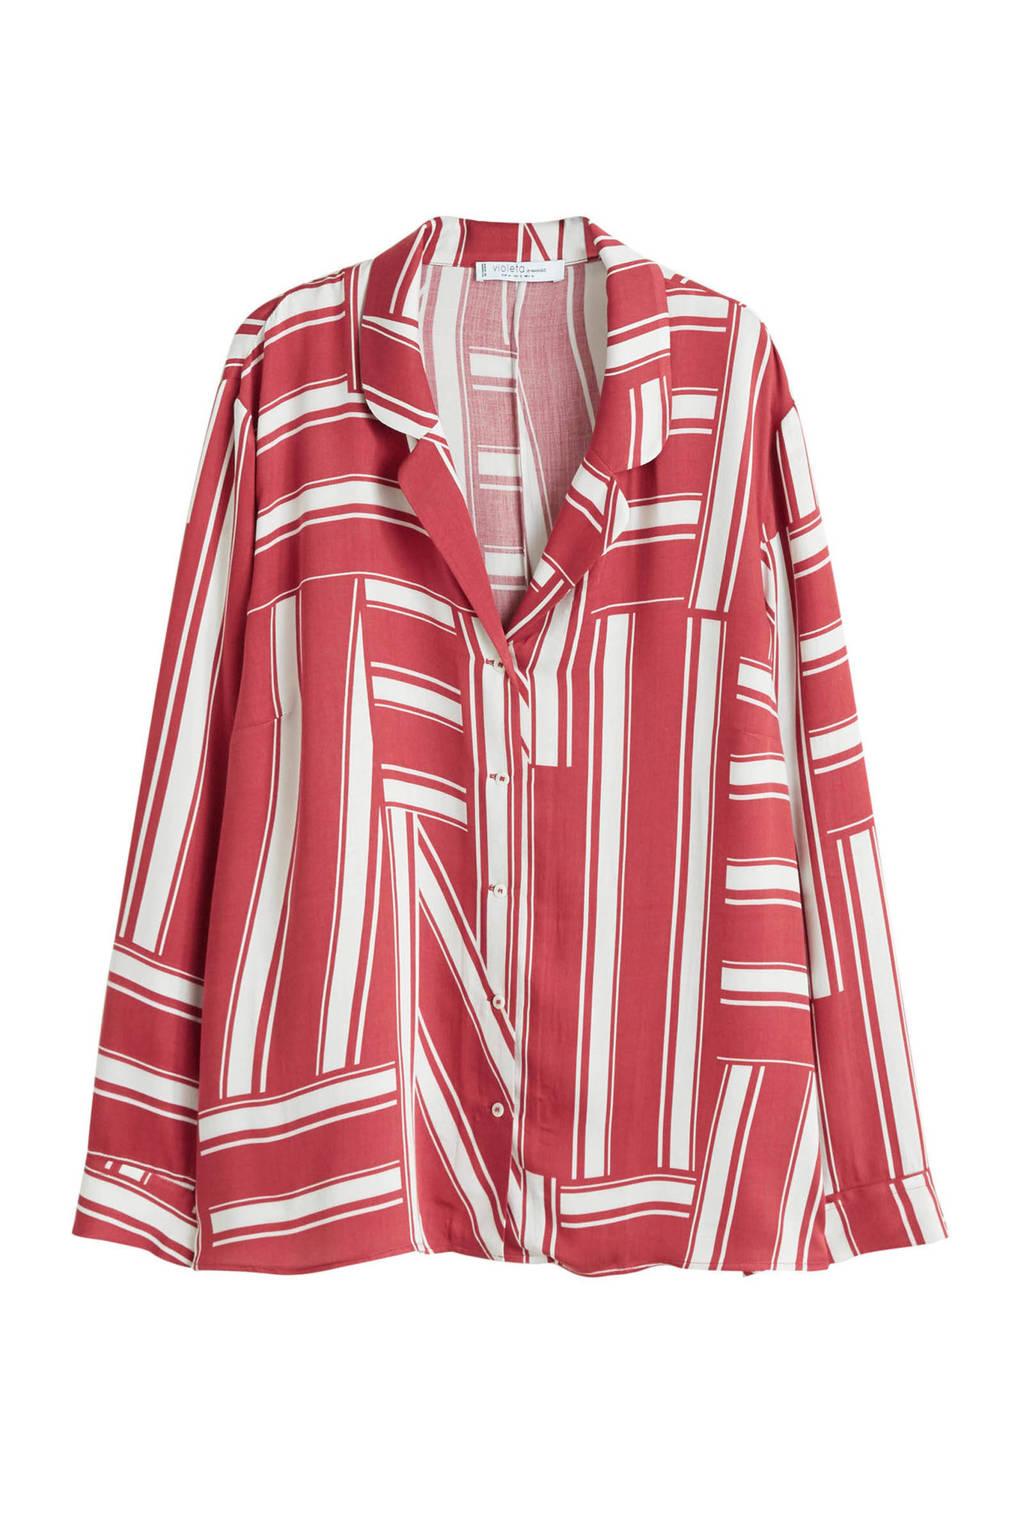 Violeta by Mango blouse met streep dessin rood, Rood/ Ecru